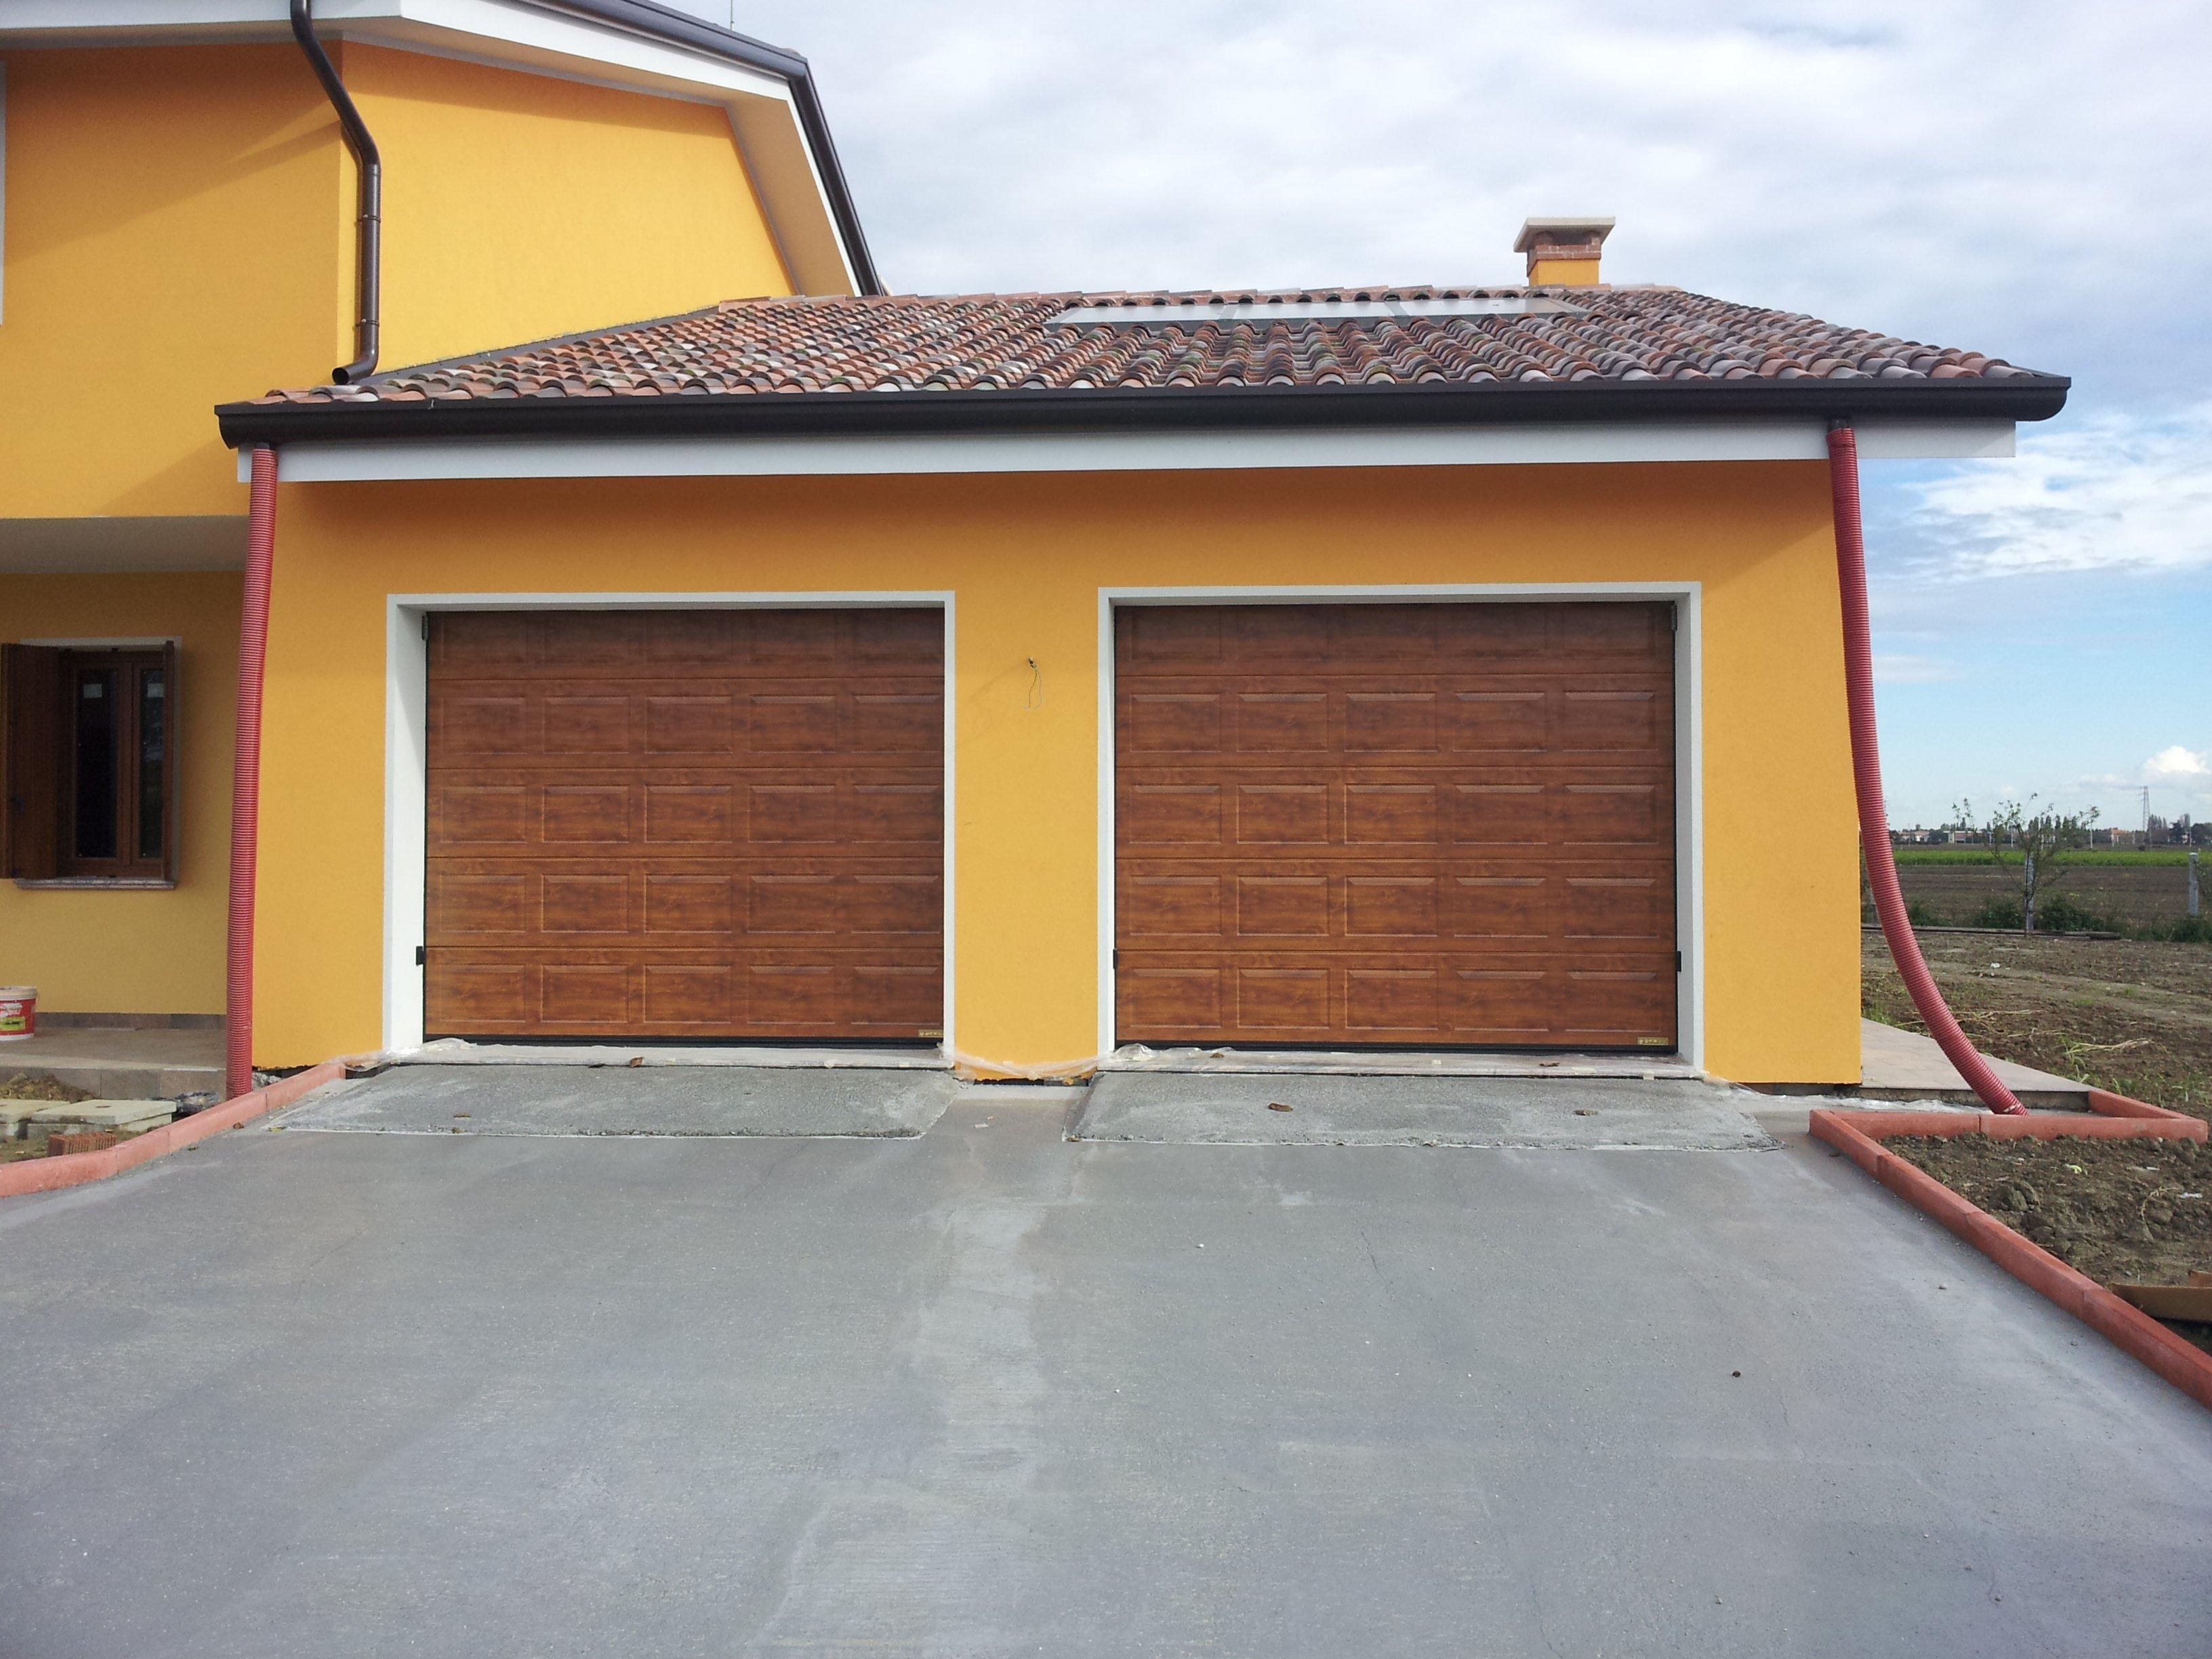 garage due entrate con serrande in legno